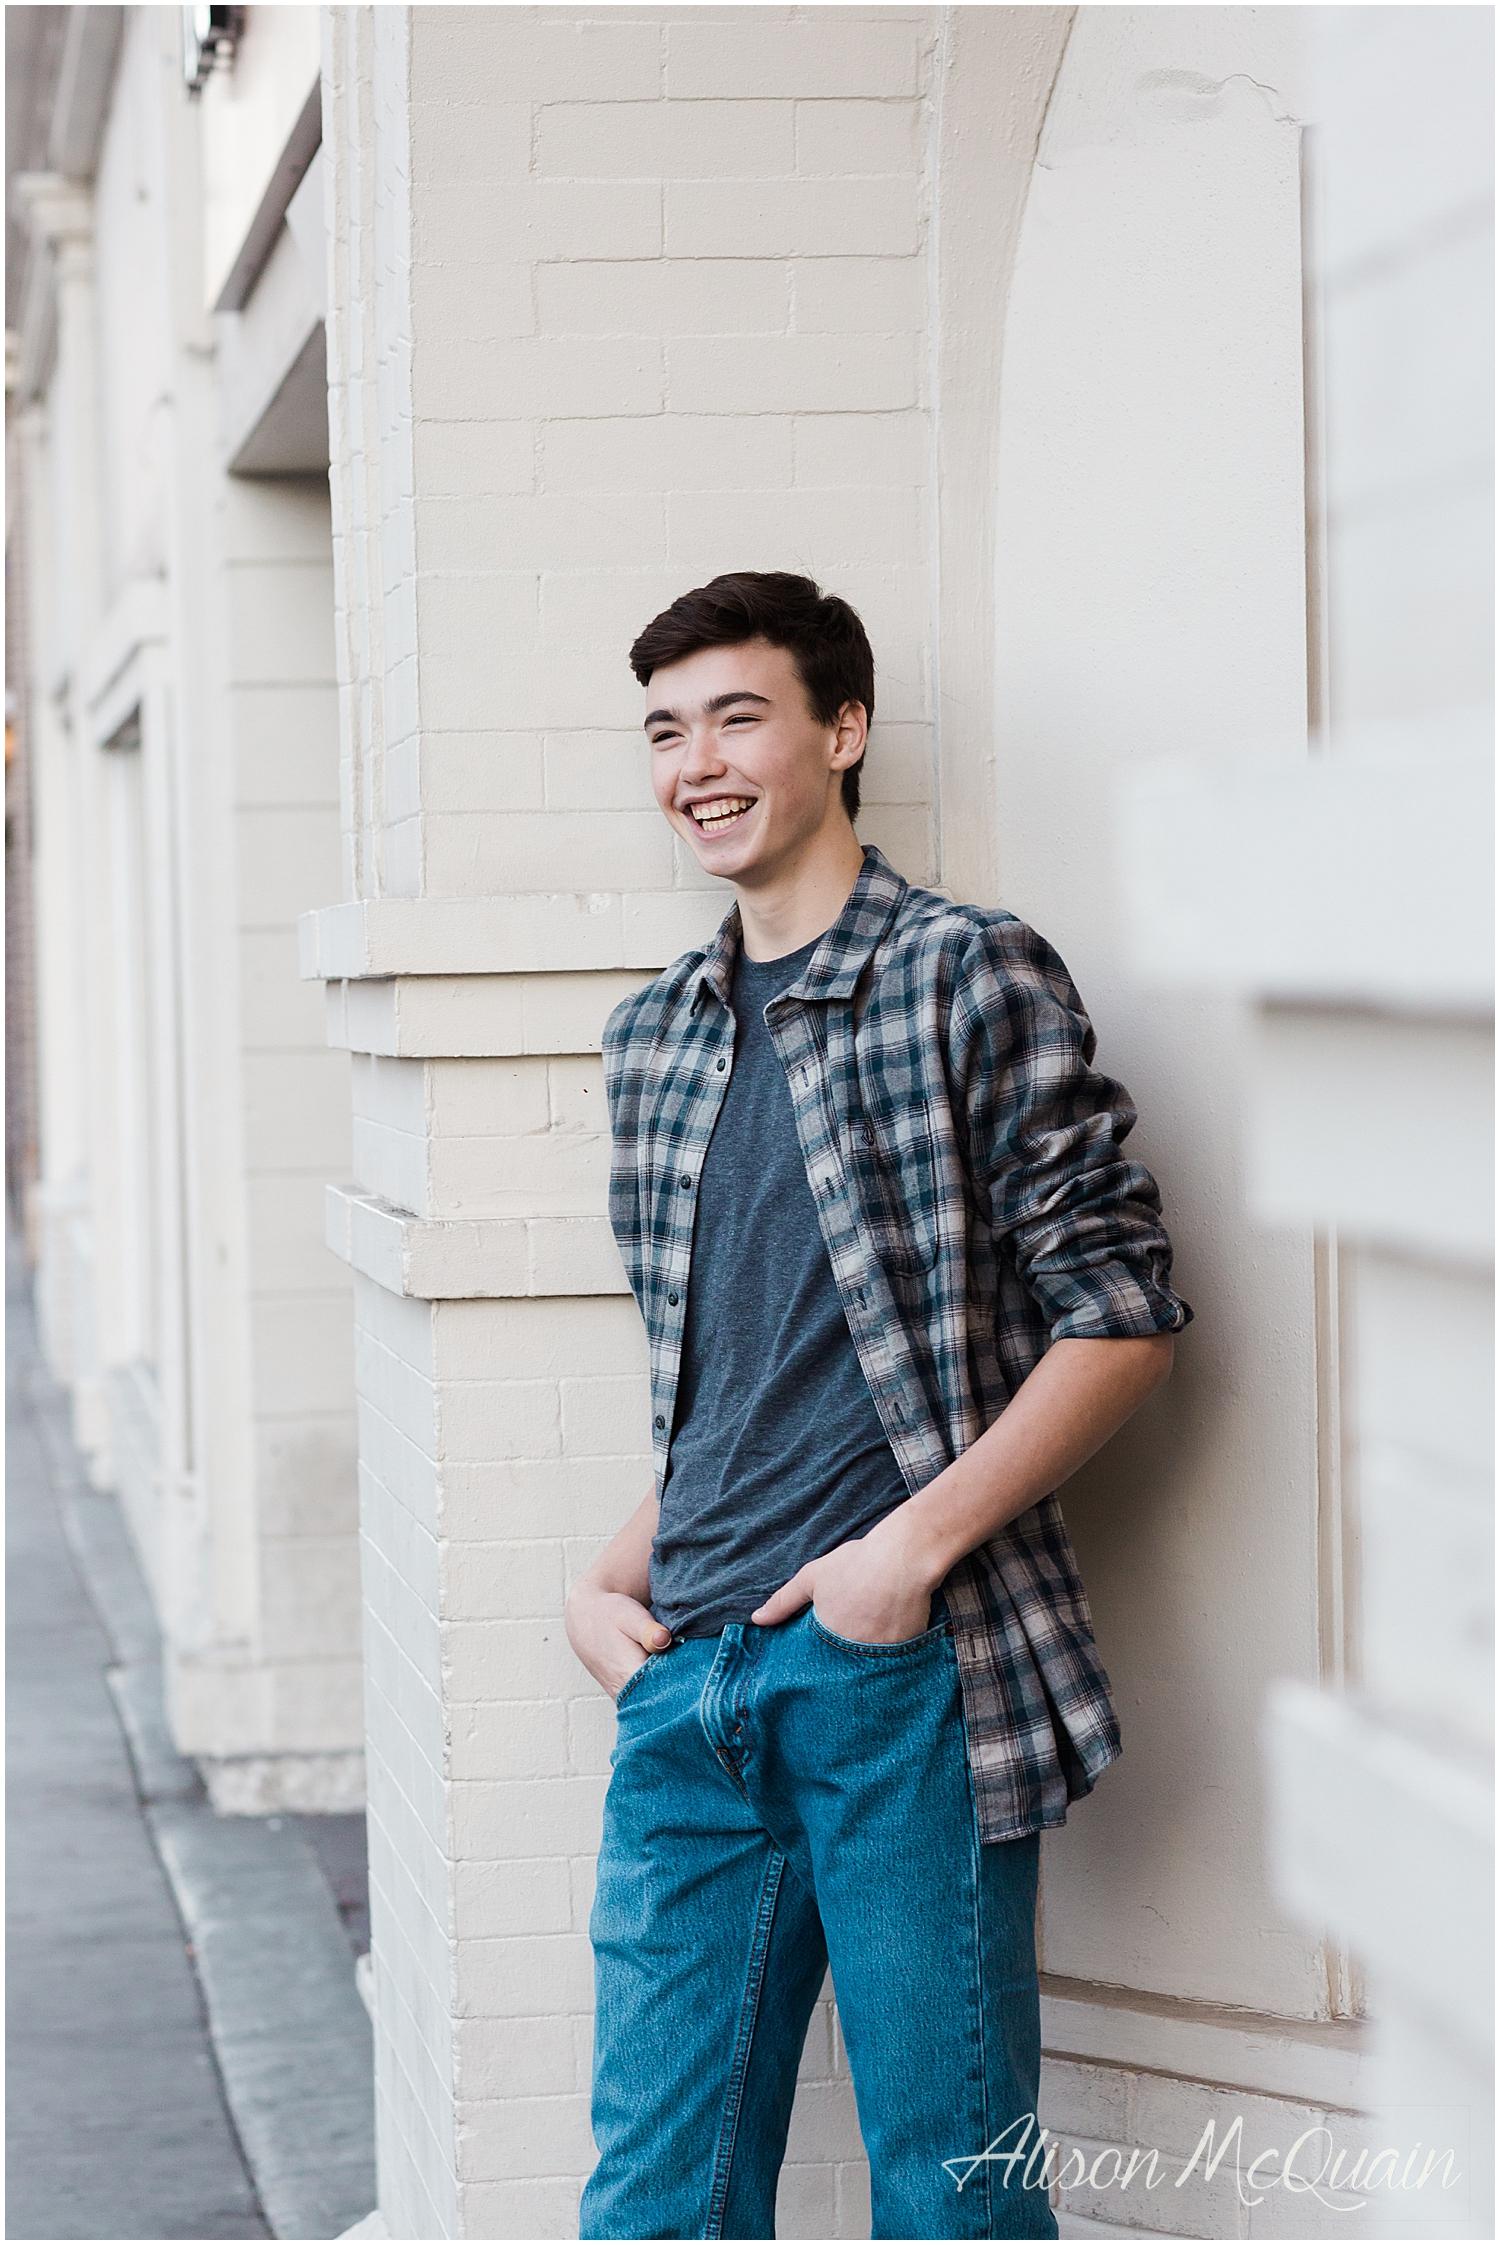 Jack_Senior_Portraits_Reno_NV_01_2019_AlisonMcQuainPhotography_0011.jpg